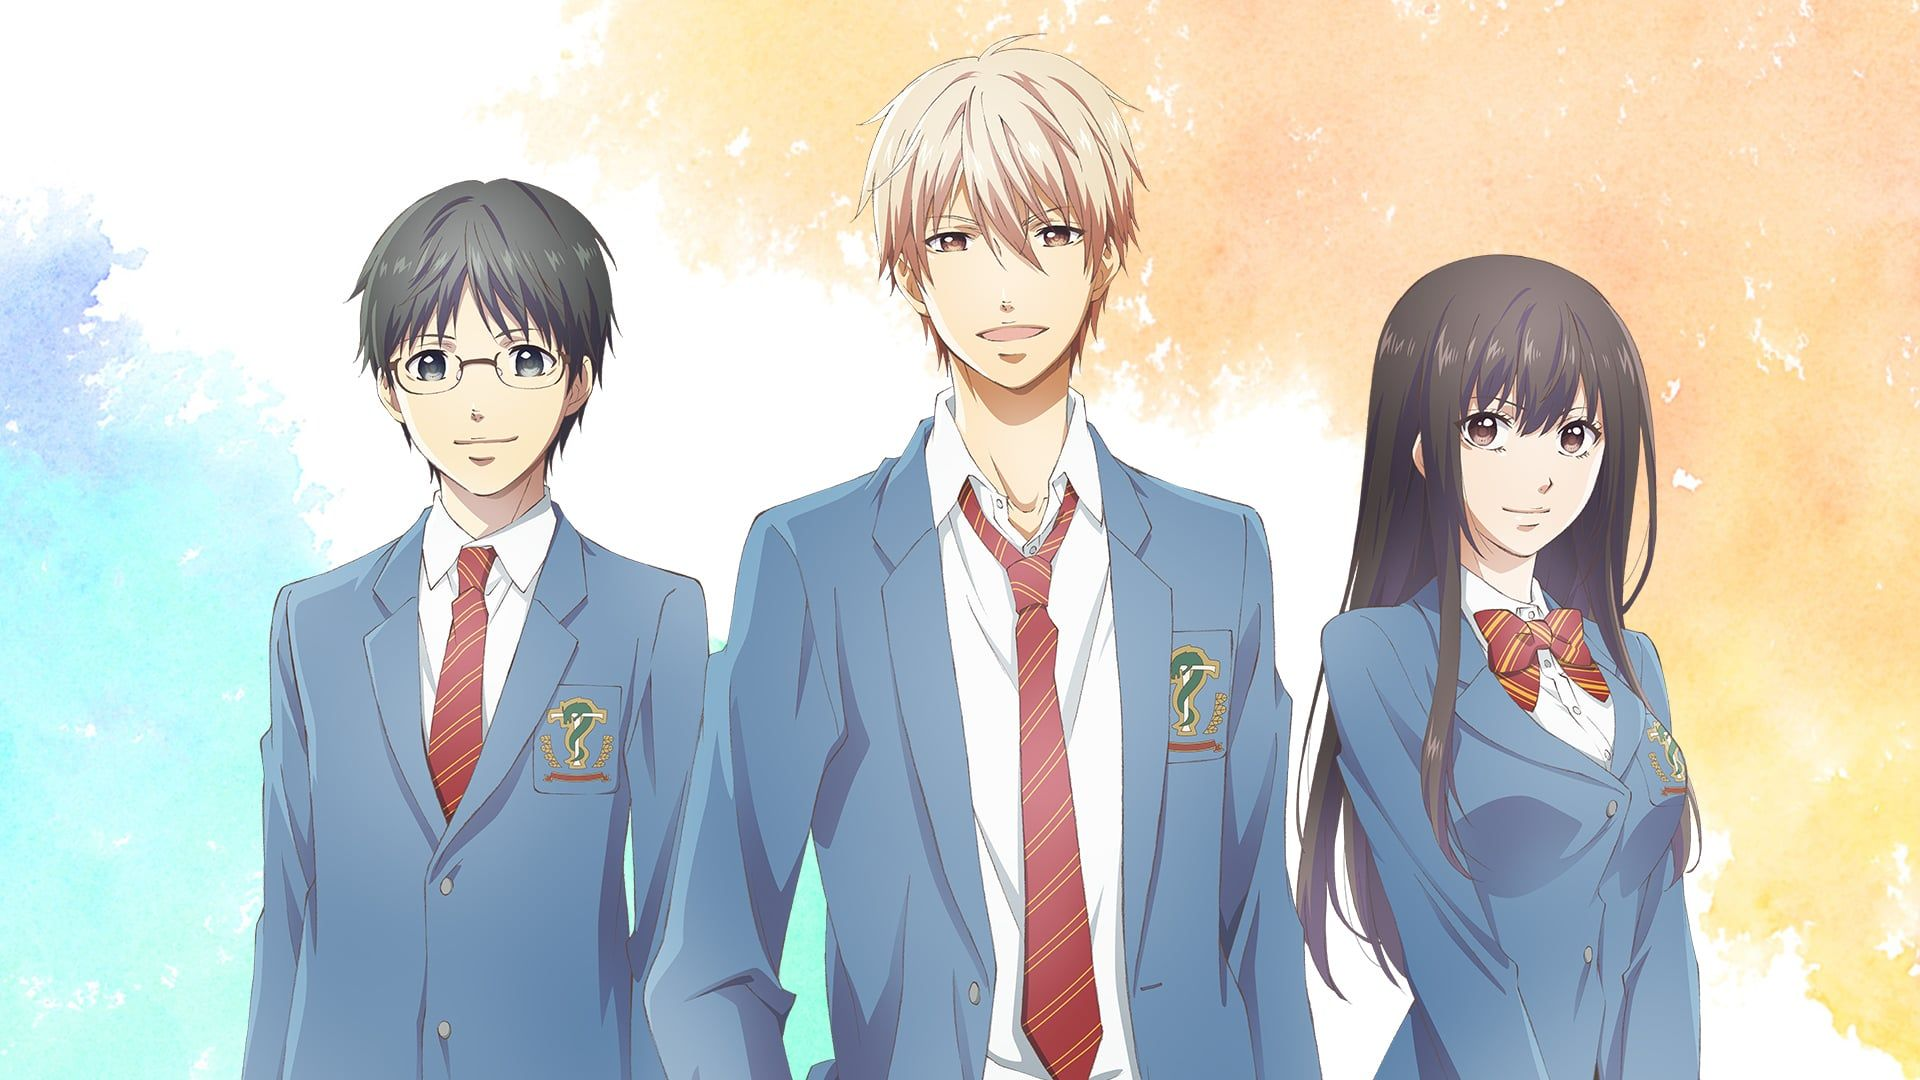 Kono Oto Tomare! 2nd Season (Season 1 Part 2) Batch